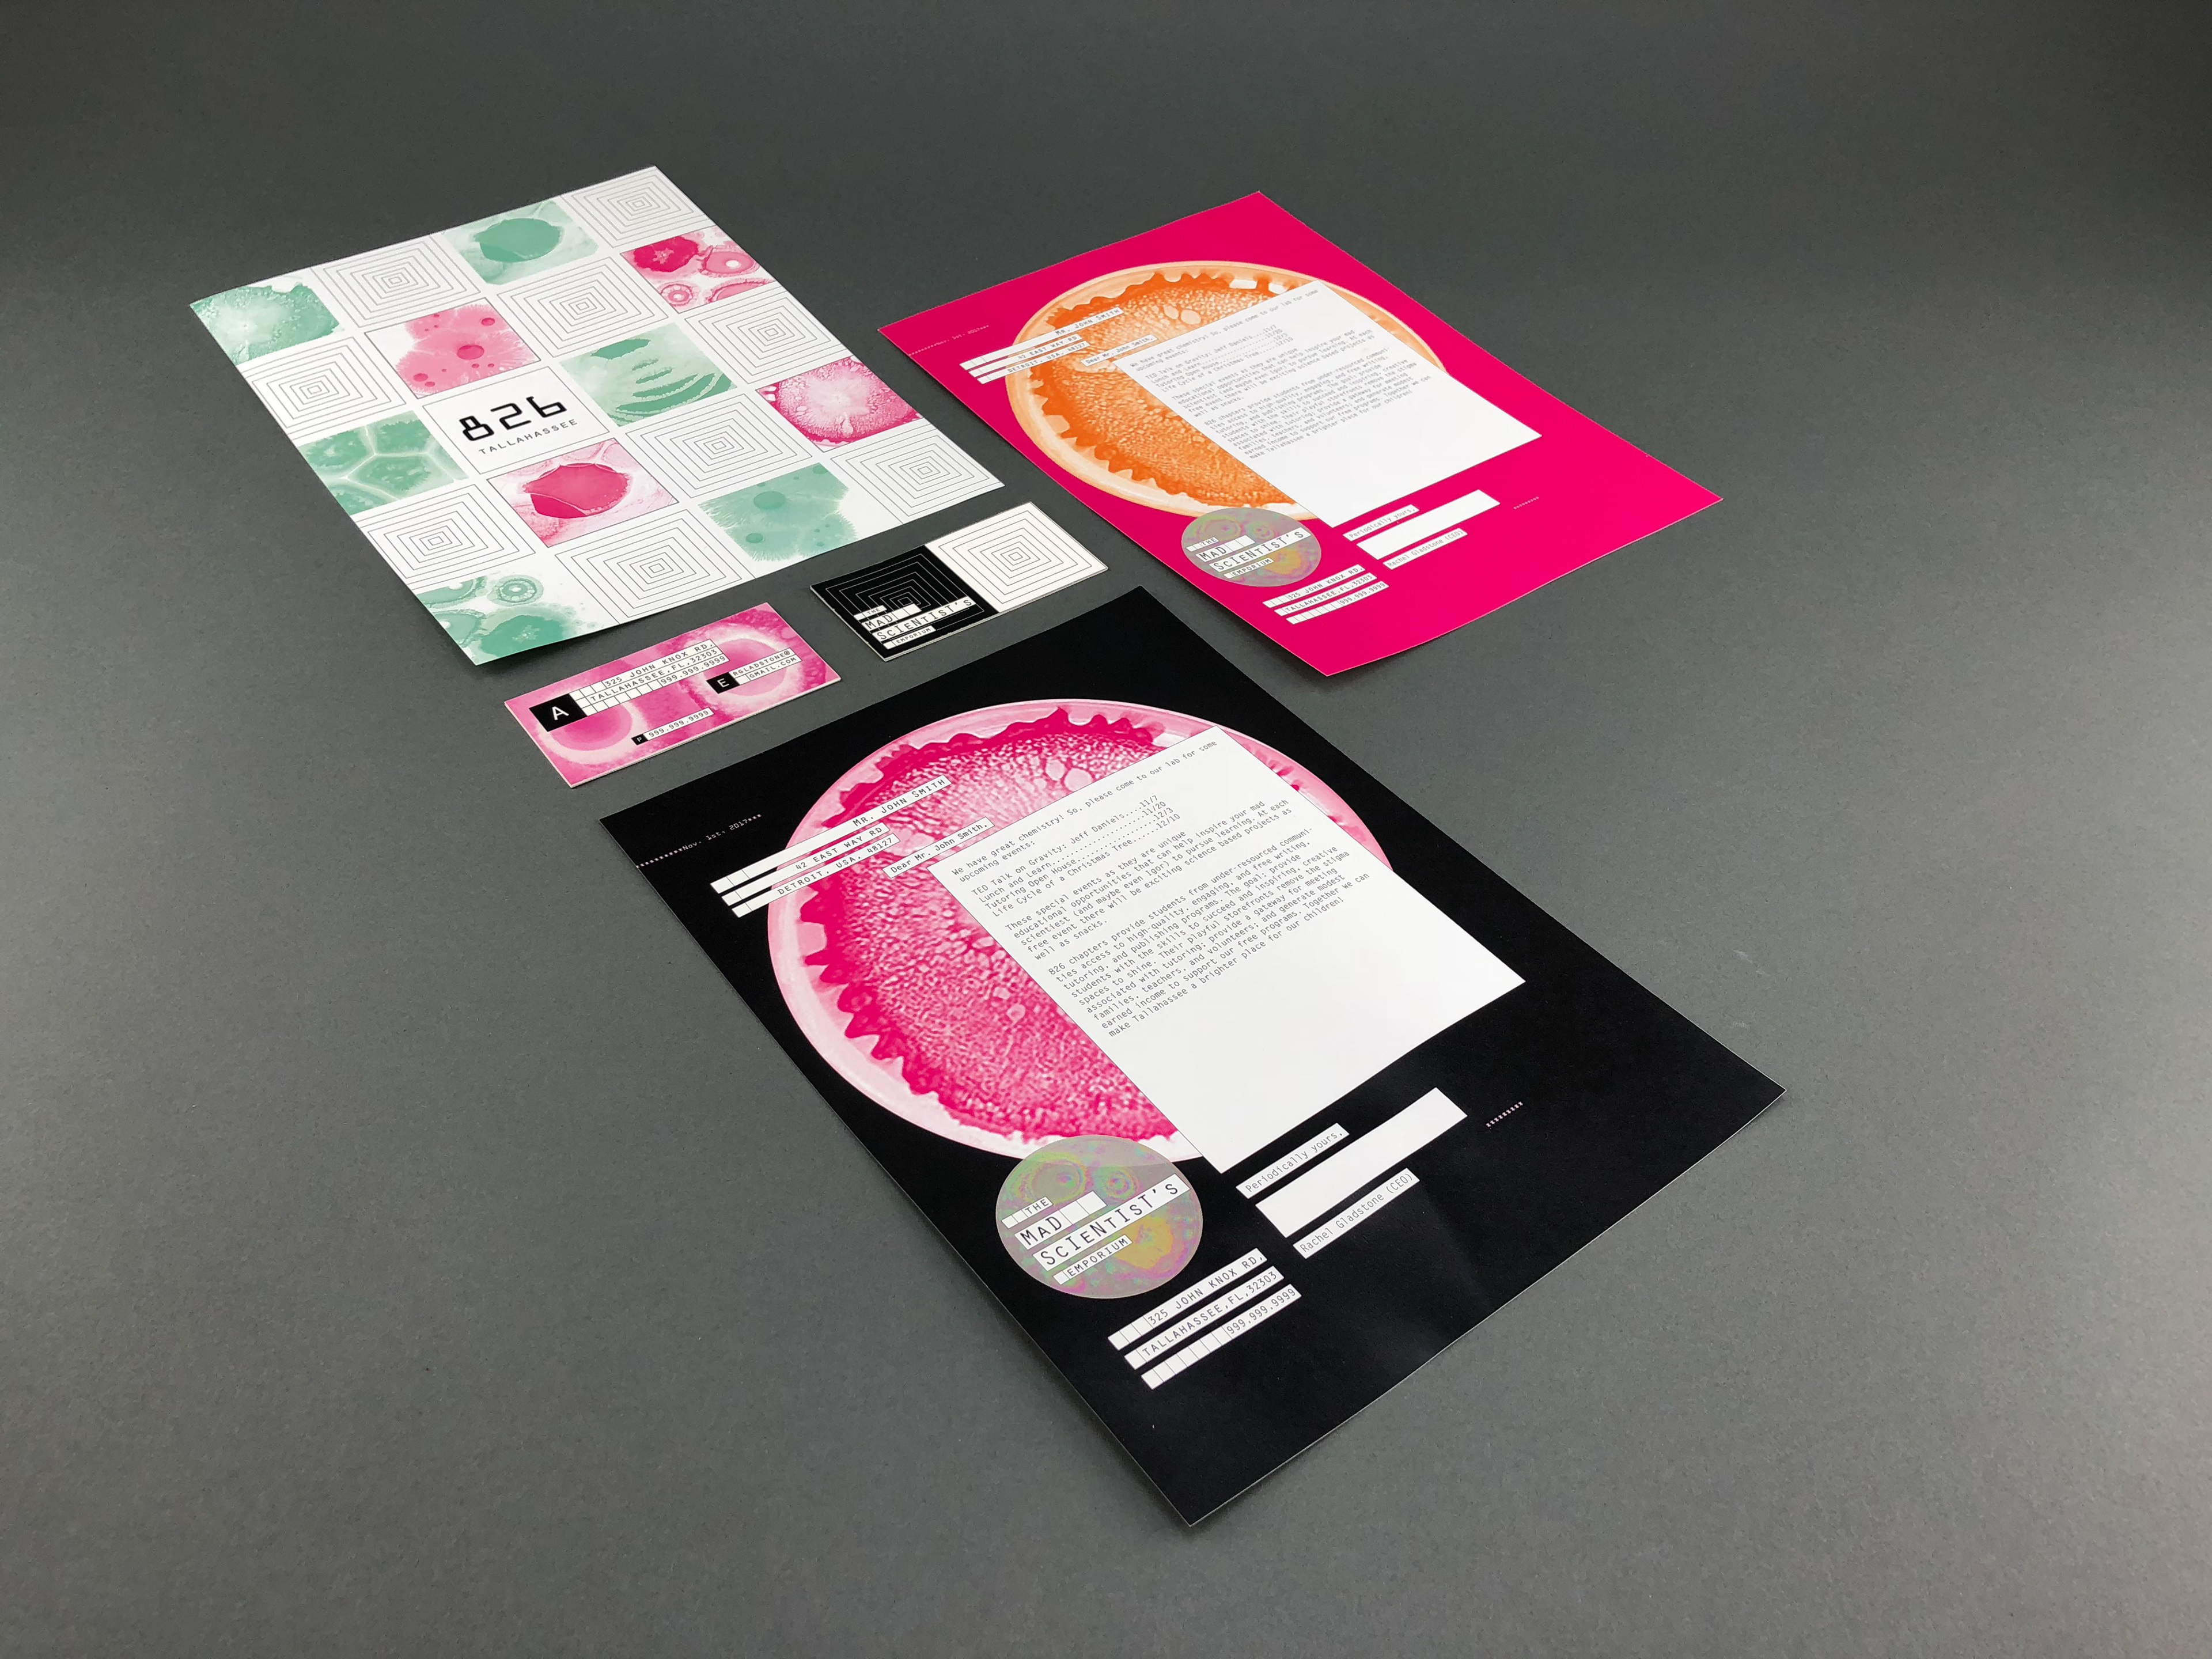 Rachel gladstone 826 tallahassee florida branding letterheads envelopes business cards and online presence colourmoves